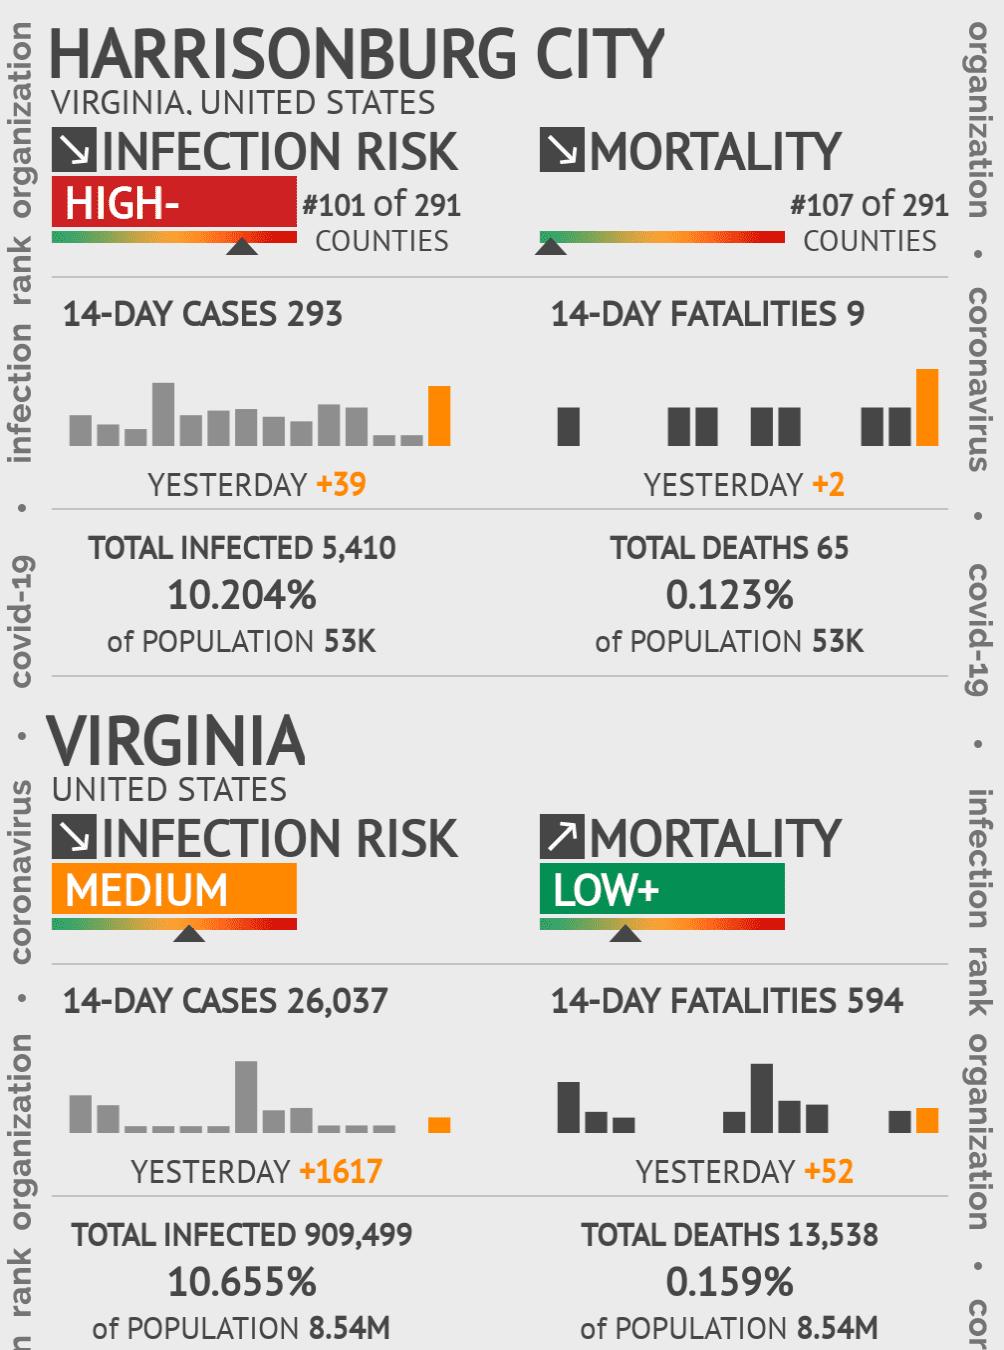 Harrisonburg City Coronavirus Covid-19 Risk of Infection on February 04, 2021